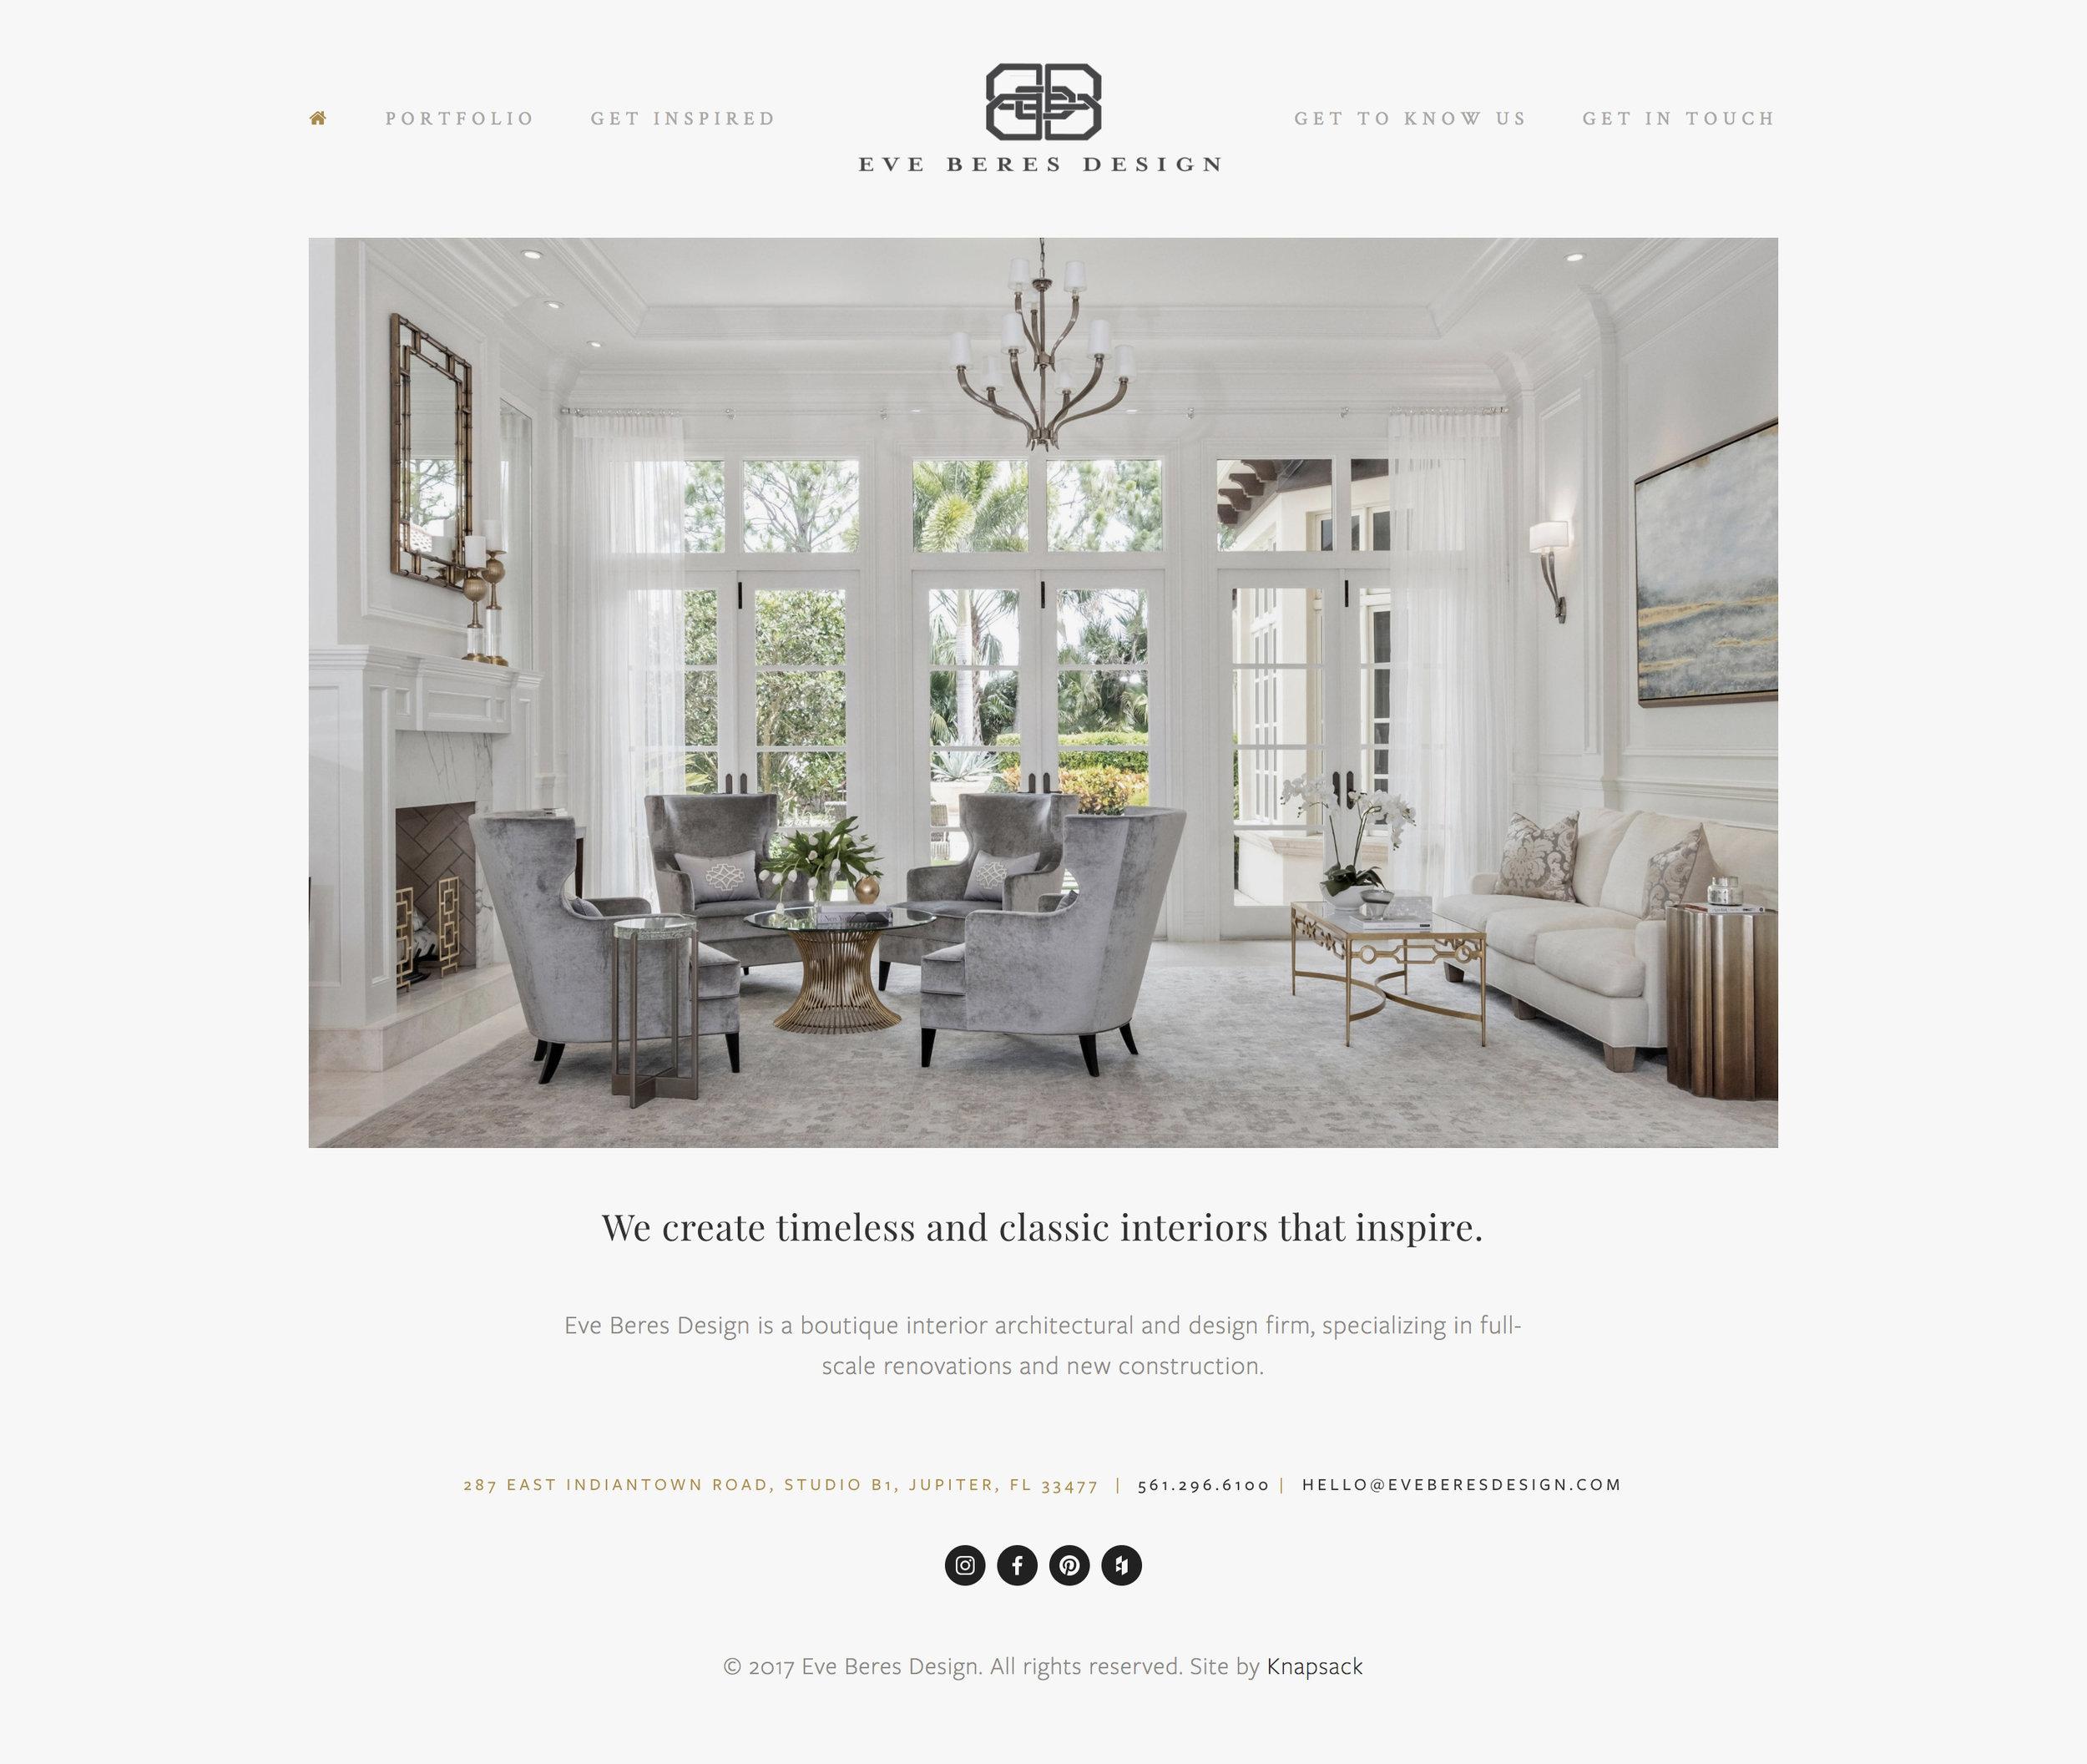 eve-beres-design-home.jpg